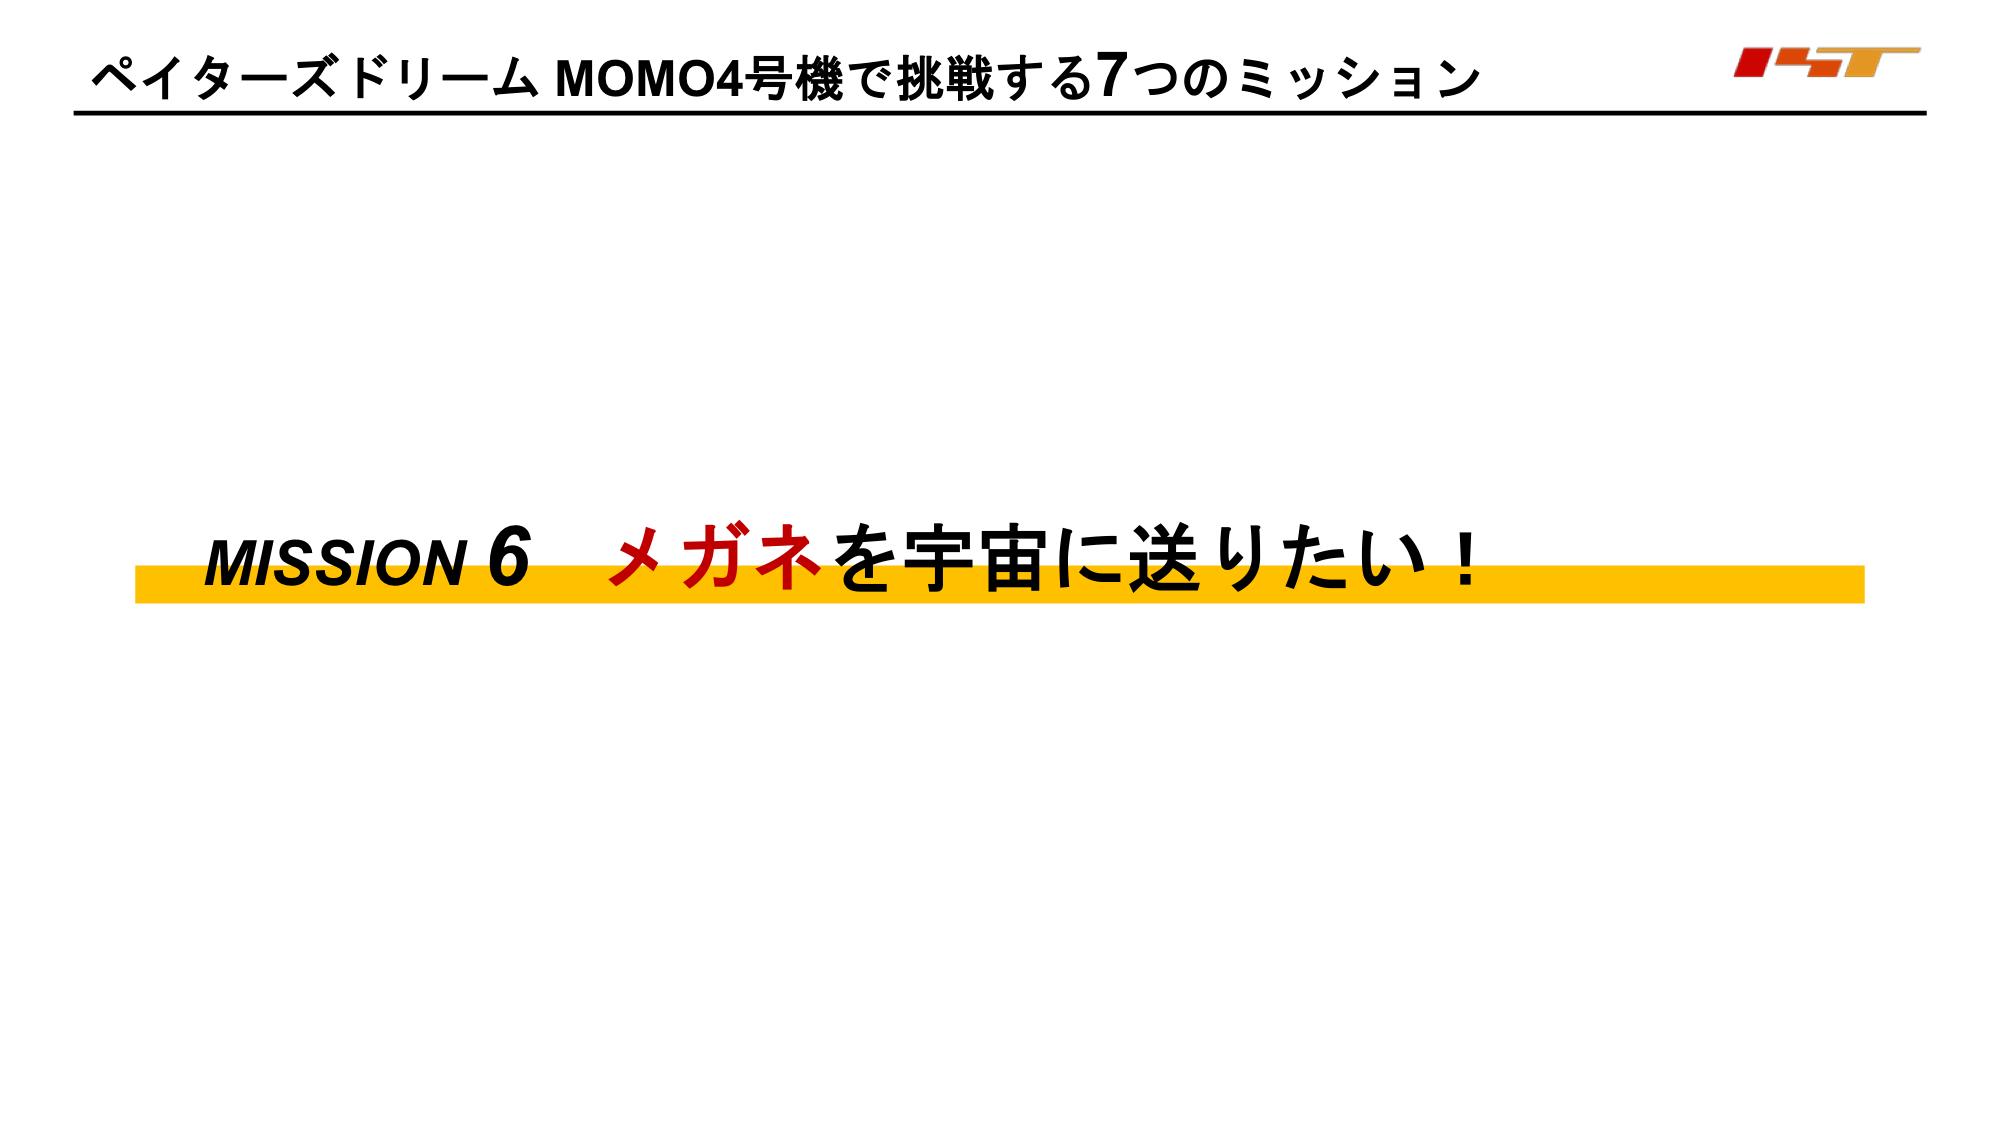 f:id:Imamura:20190628161337p:plain